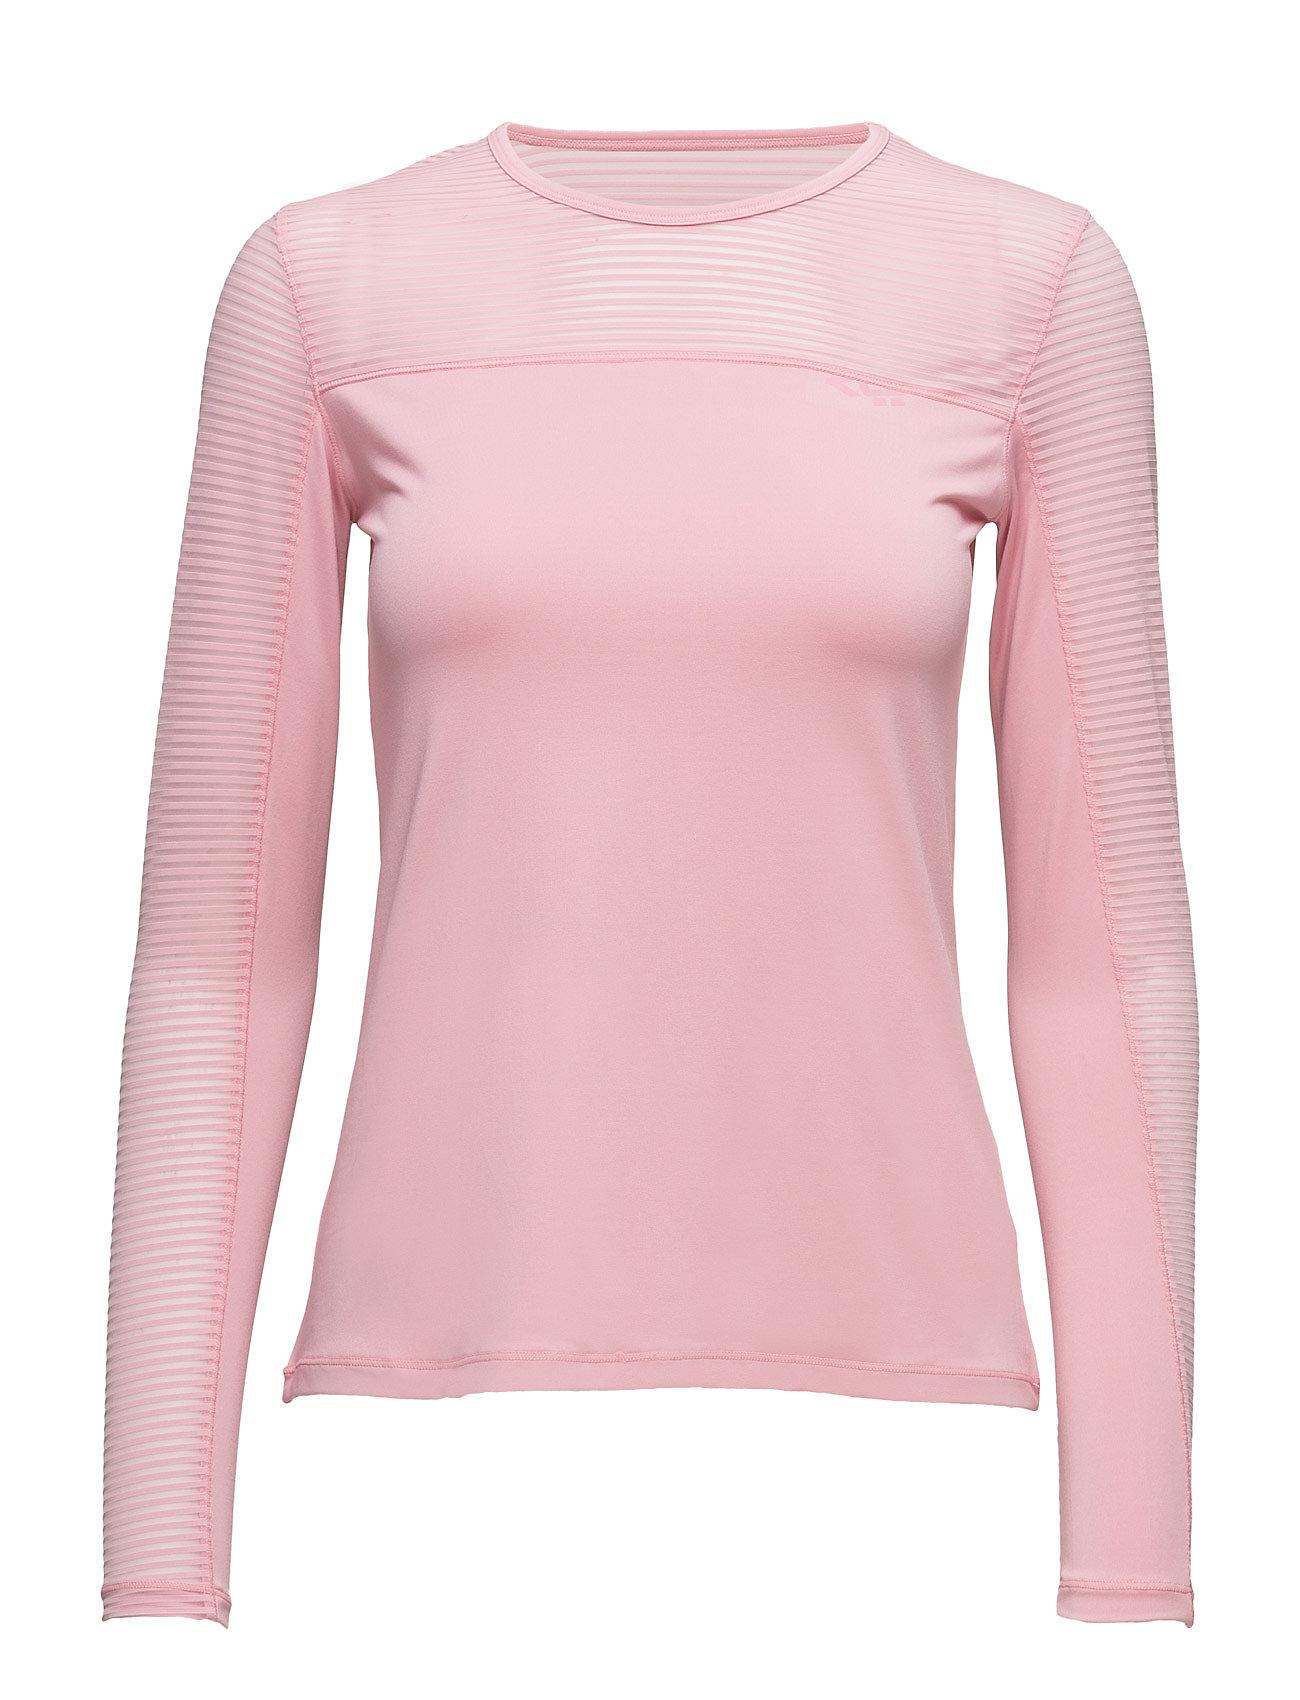 Miko Long Sleeve Rˆhnisch Sweatshirts til Damer i